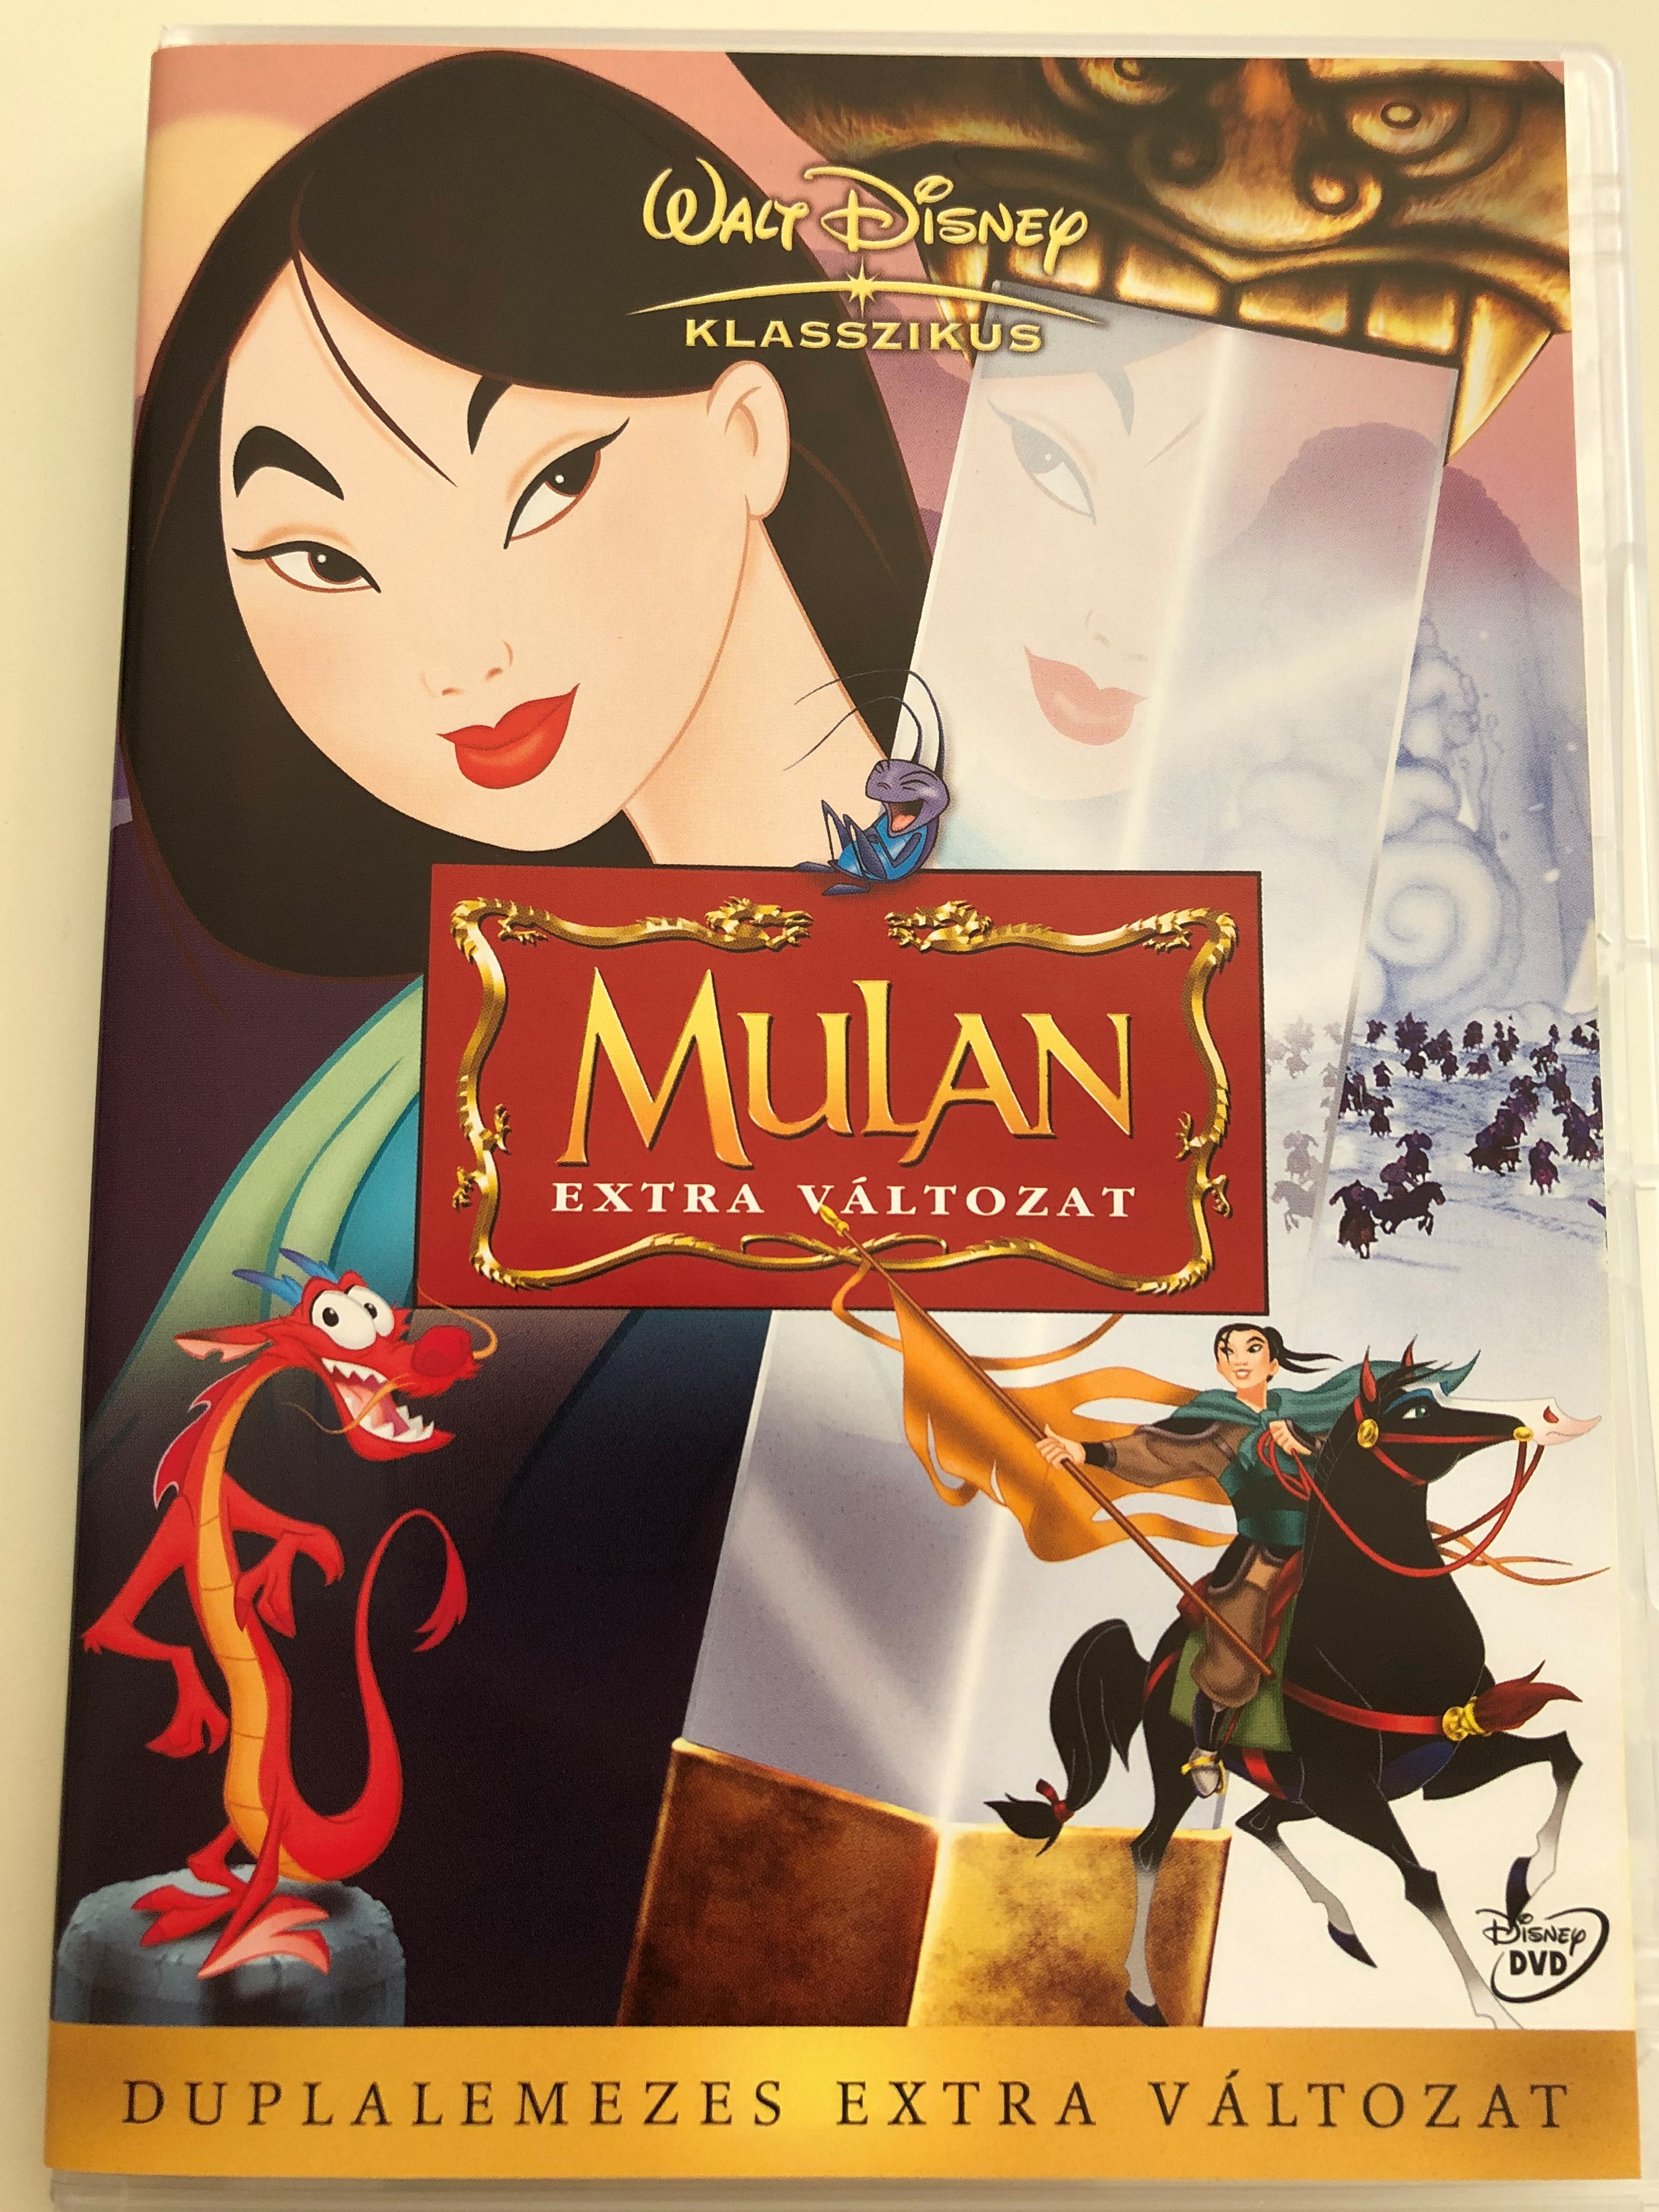 mulan-special-edition-2-dvd-1998-mulan-extra-v-ltozat-duplalemezes-extra-v-ltozat-directed-by-barry-cook-tony-bancroft-starring-ming-na-wen-eddie-murphy-bd-wong-miguel-ferrer-june-foray-1-.jpg